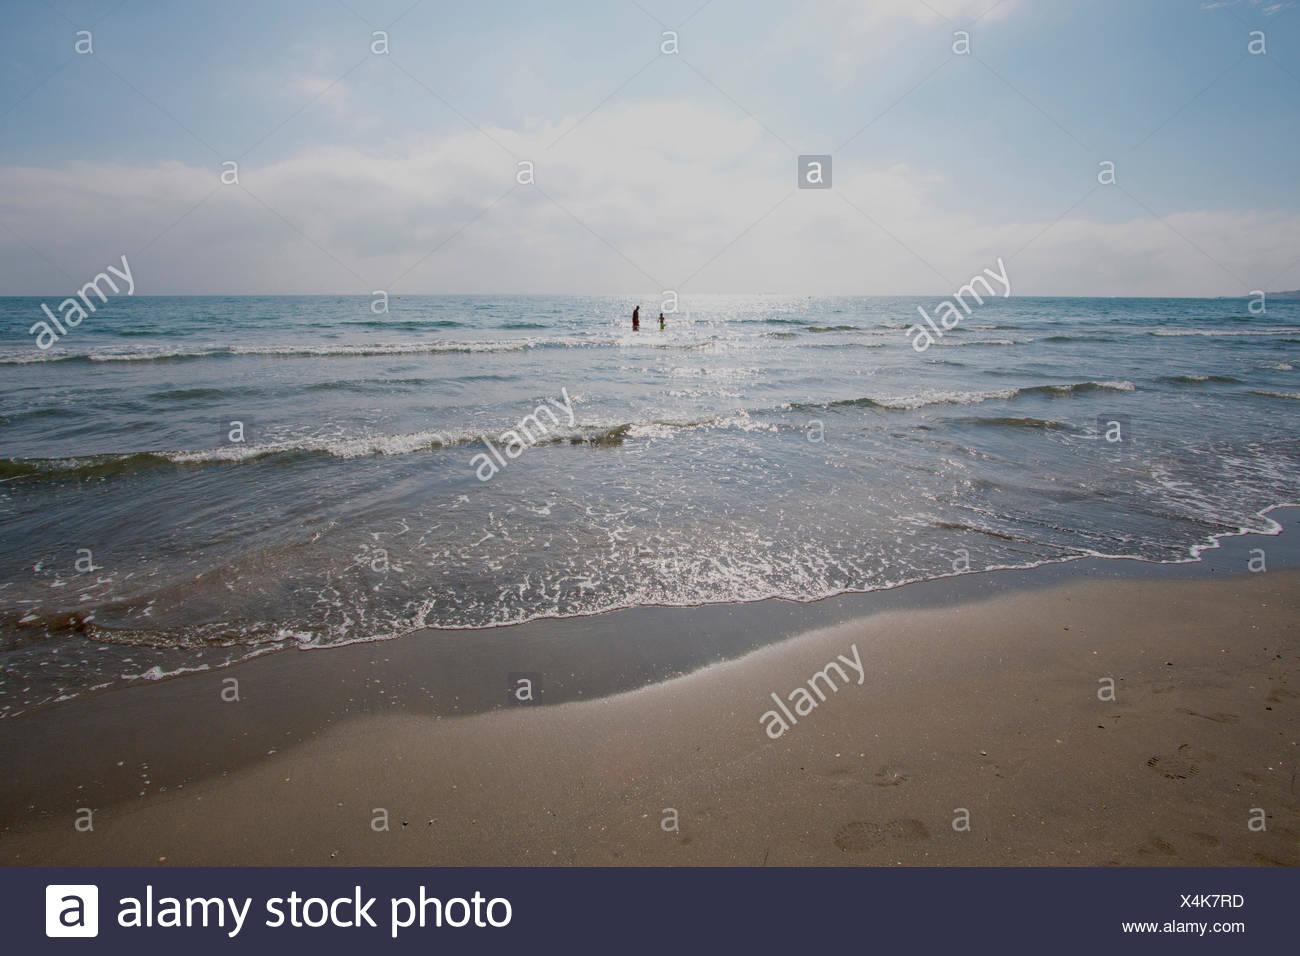 frankreich europa s te languedoc roussillon h rault strand meer sand strand himmel. Black Bedroom Furniture Sets. Home Design Ideas